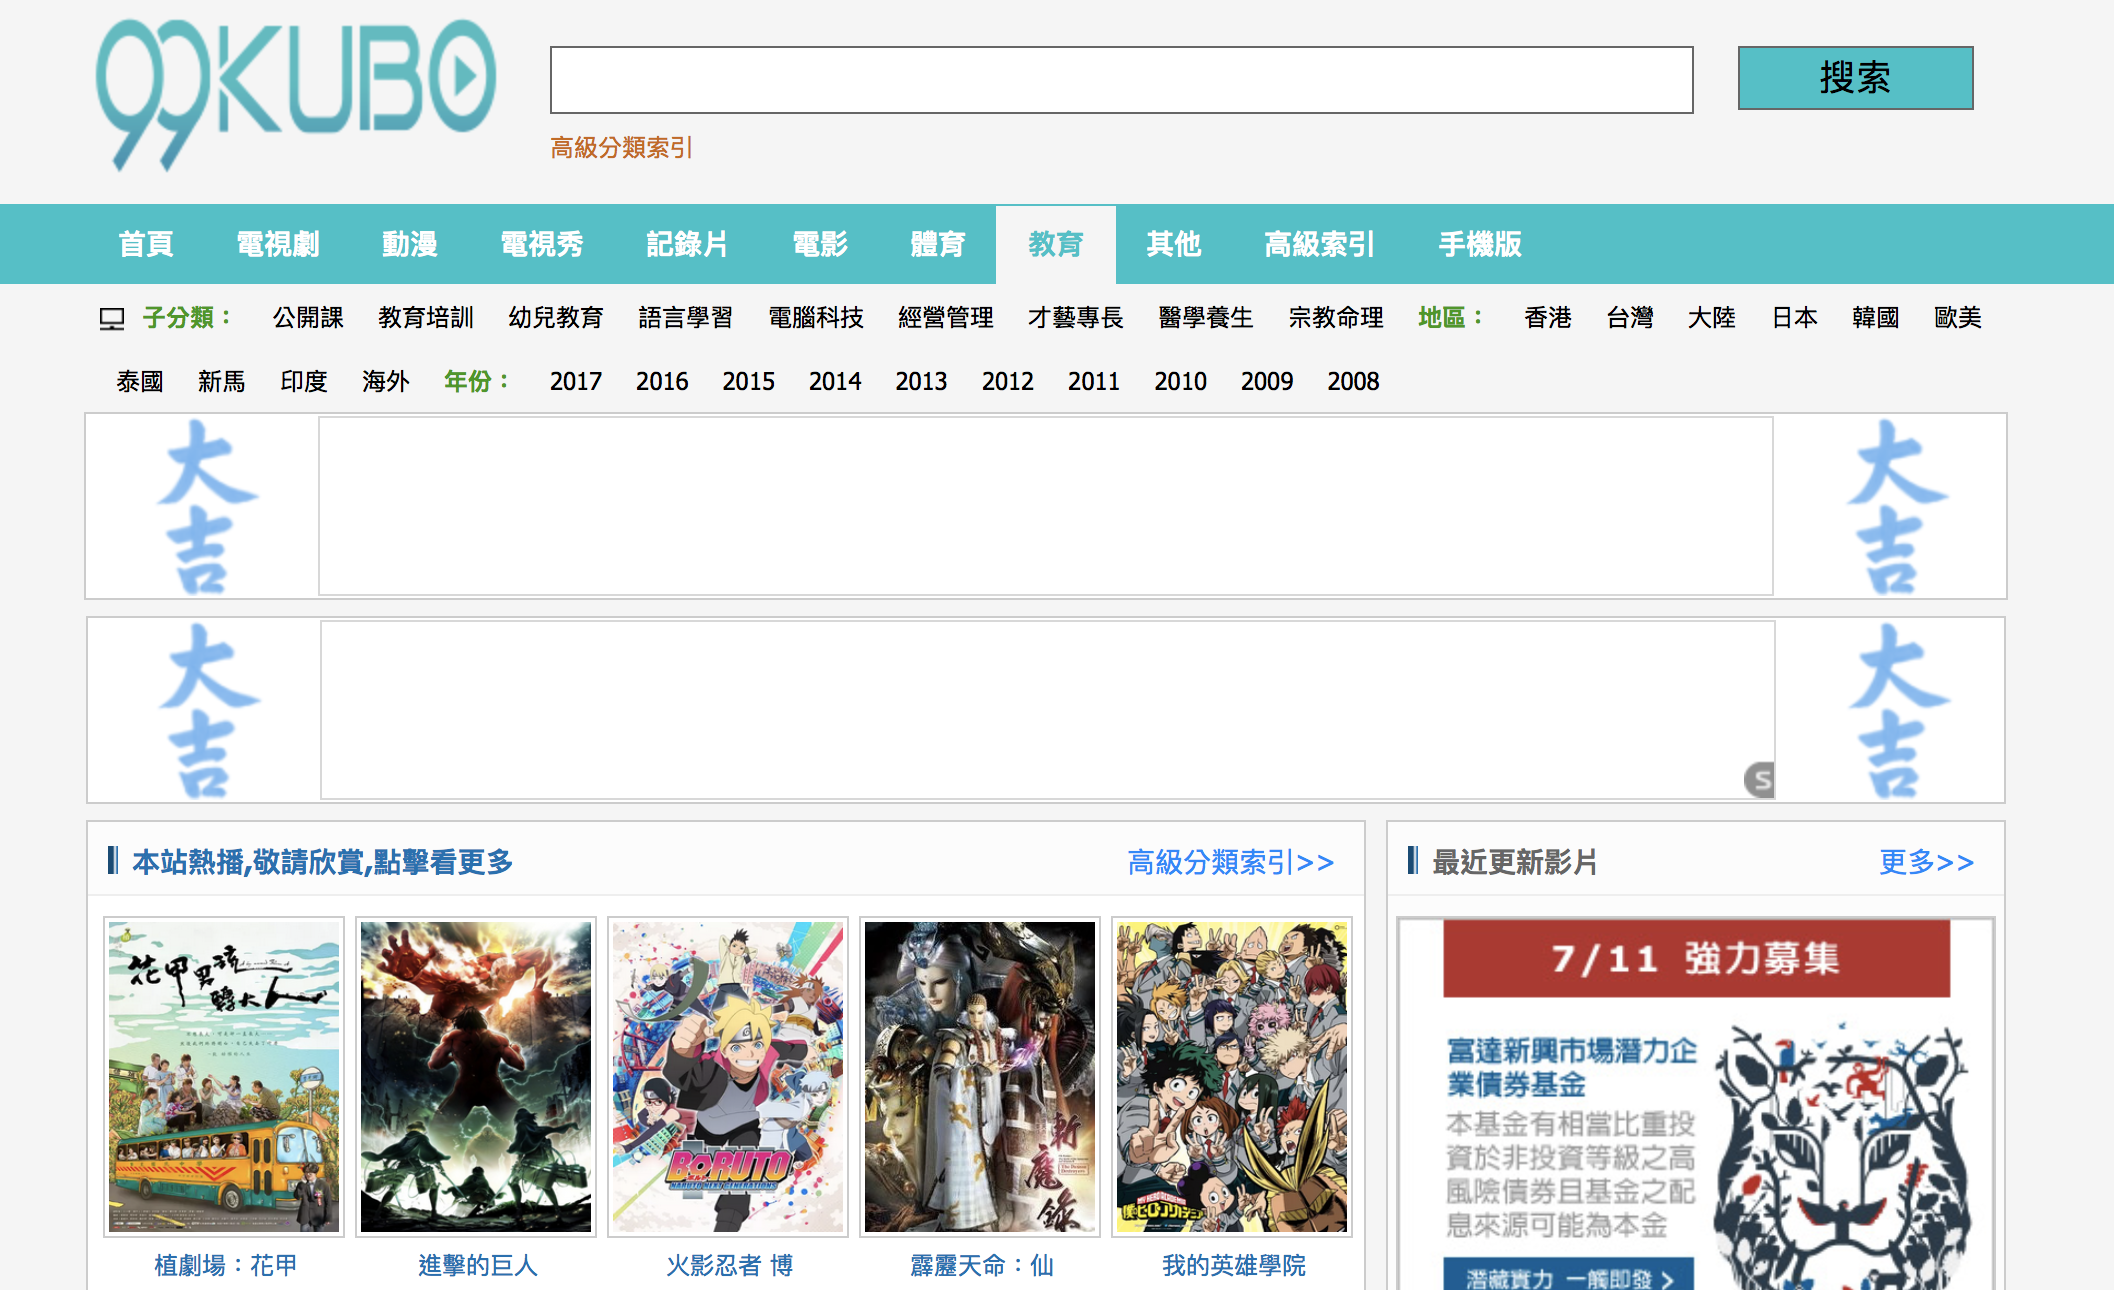 123kubo app